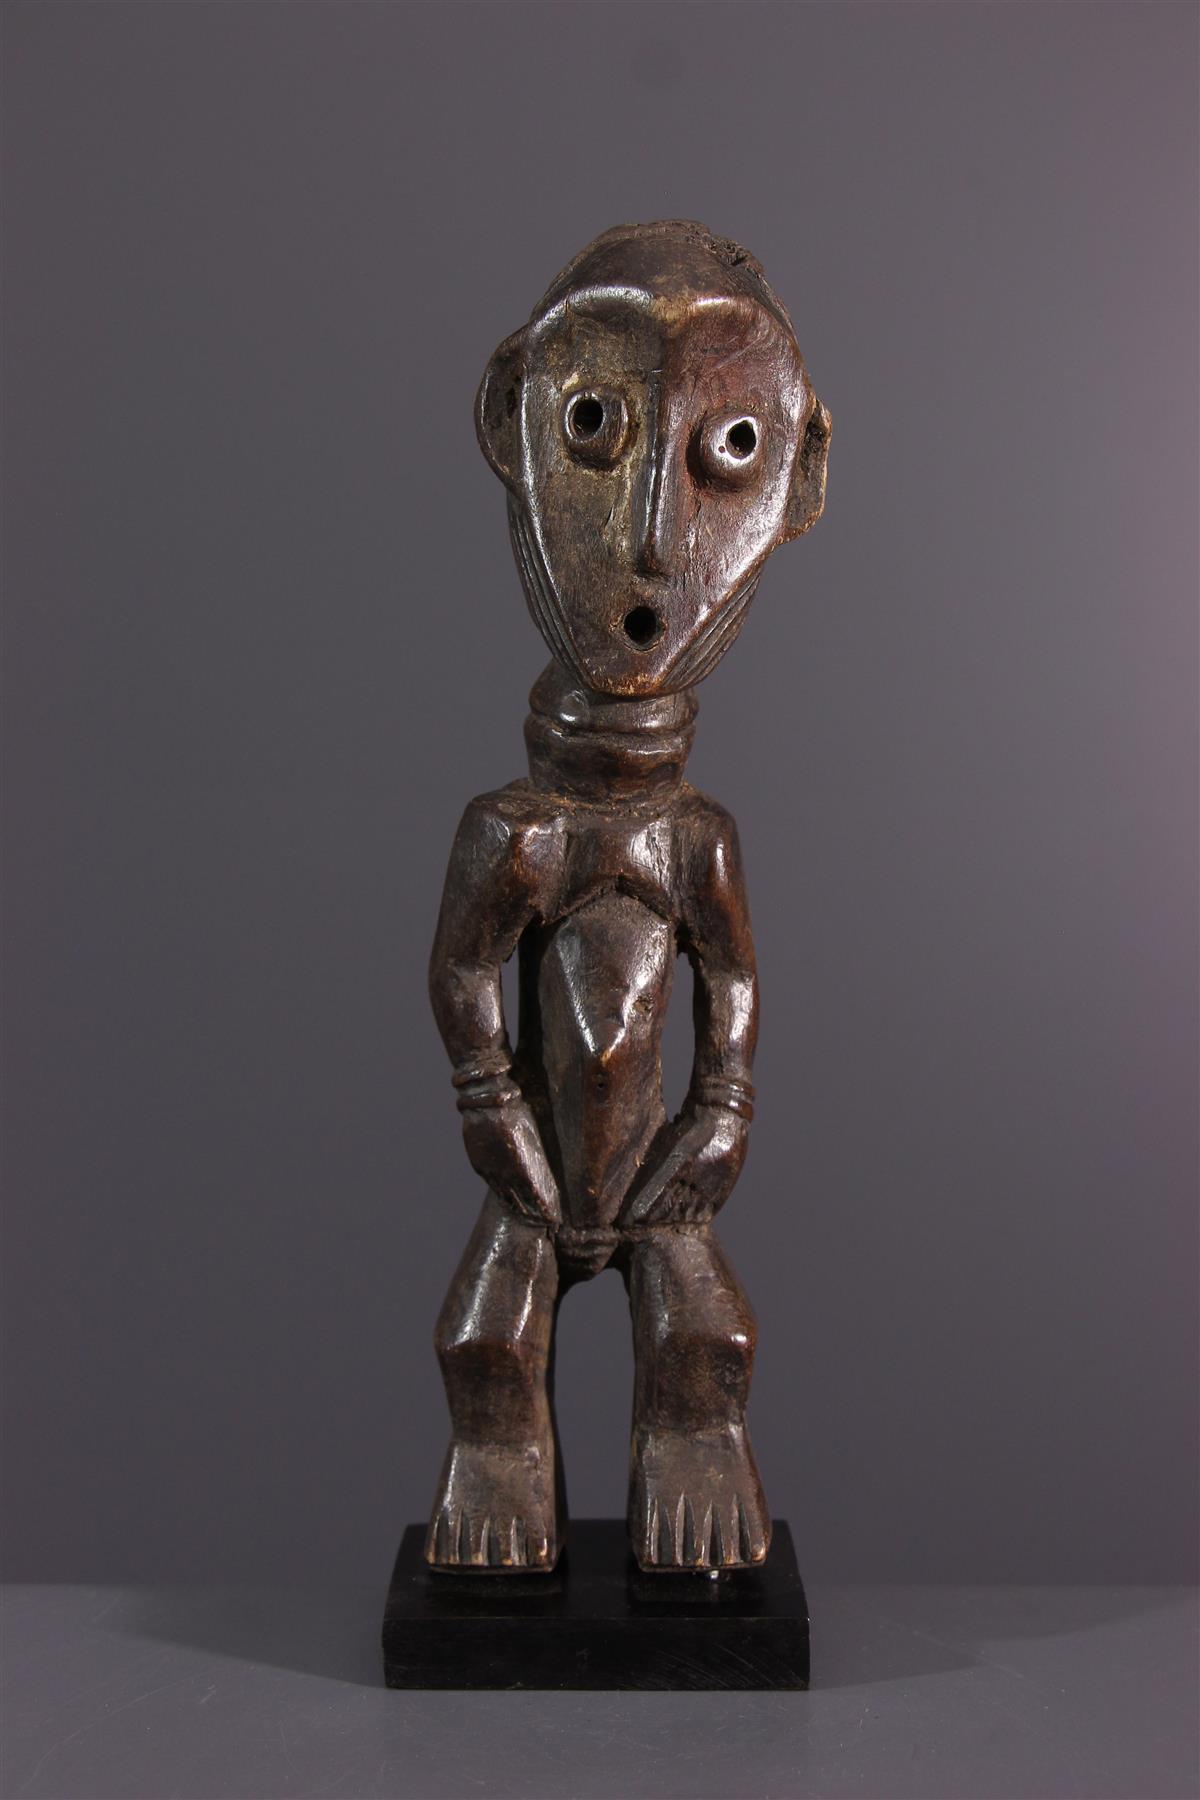 Songola statue - Tribal art